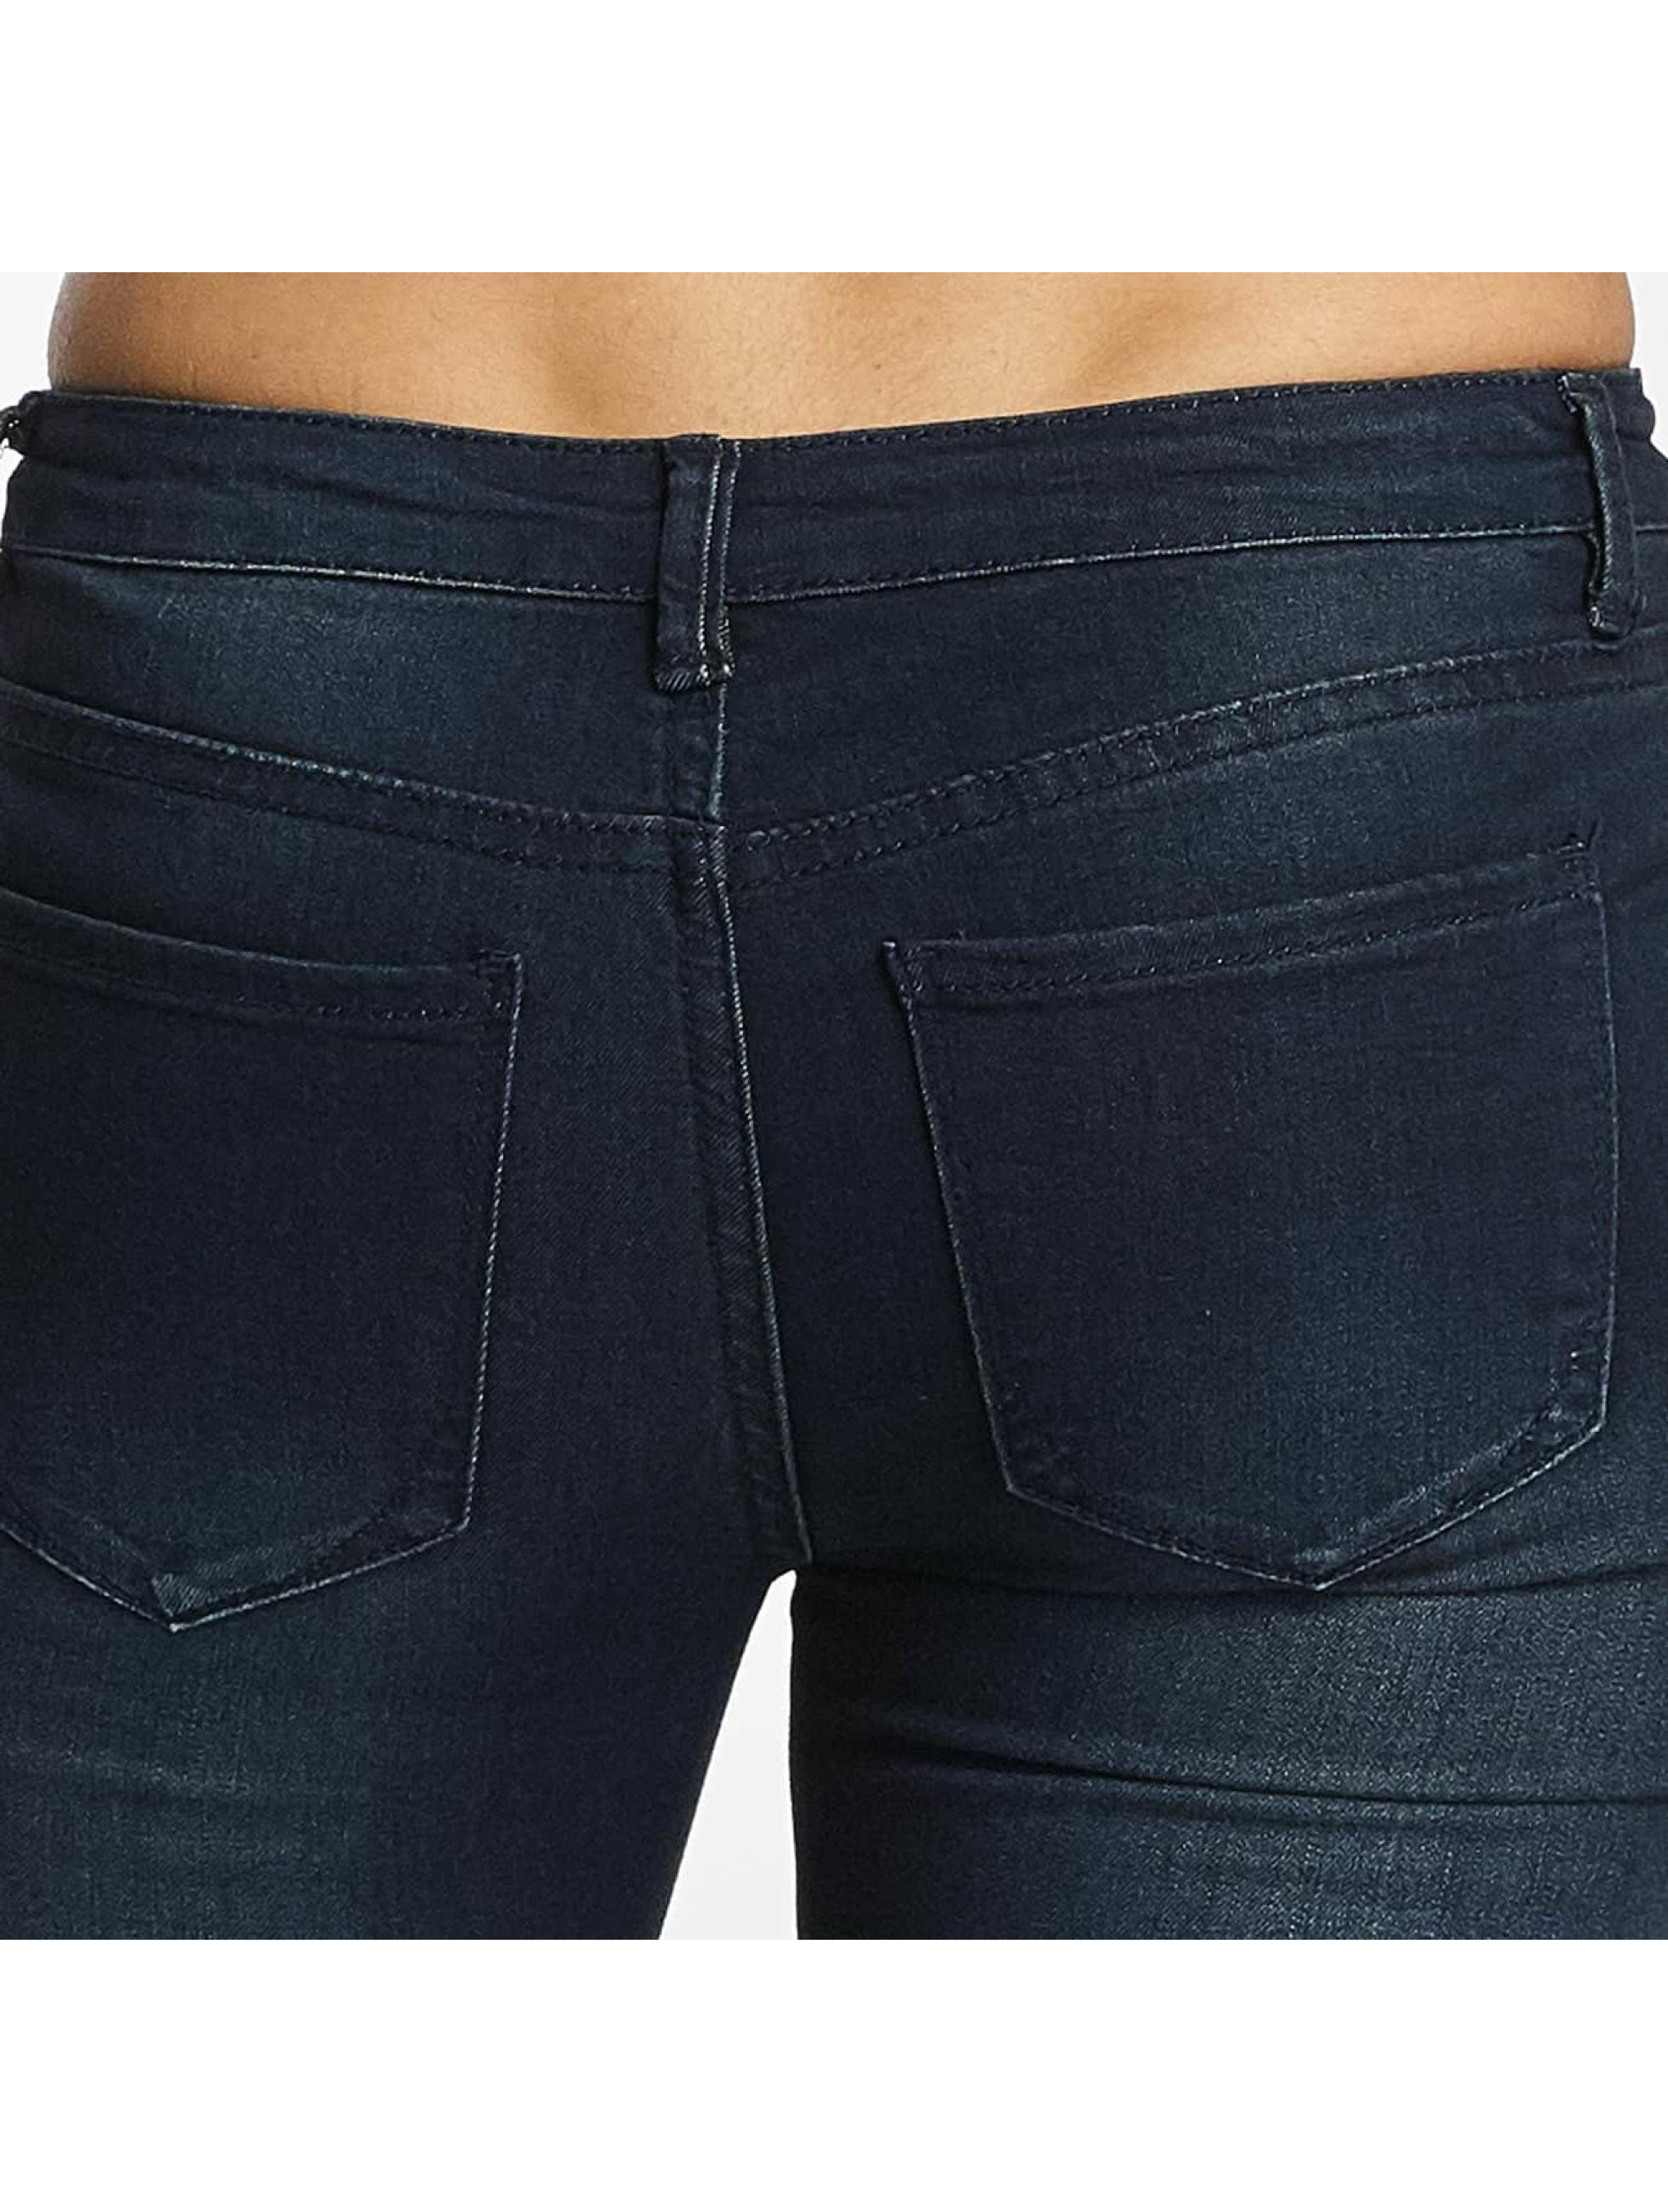 Hailys Skinny Jeans Mia Basic čern